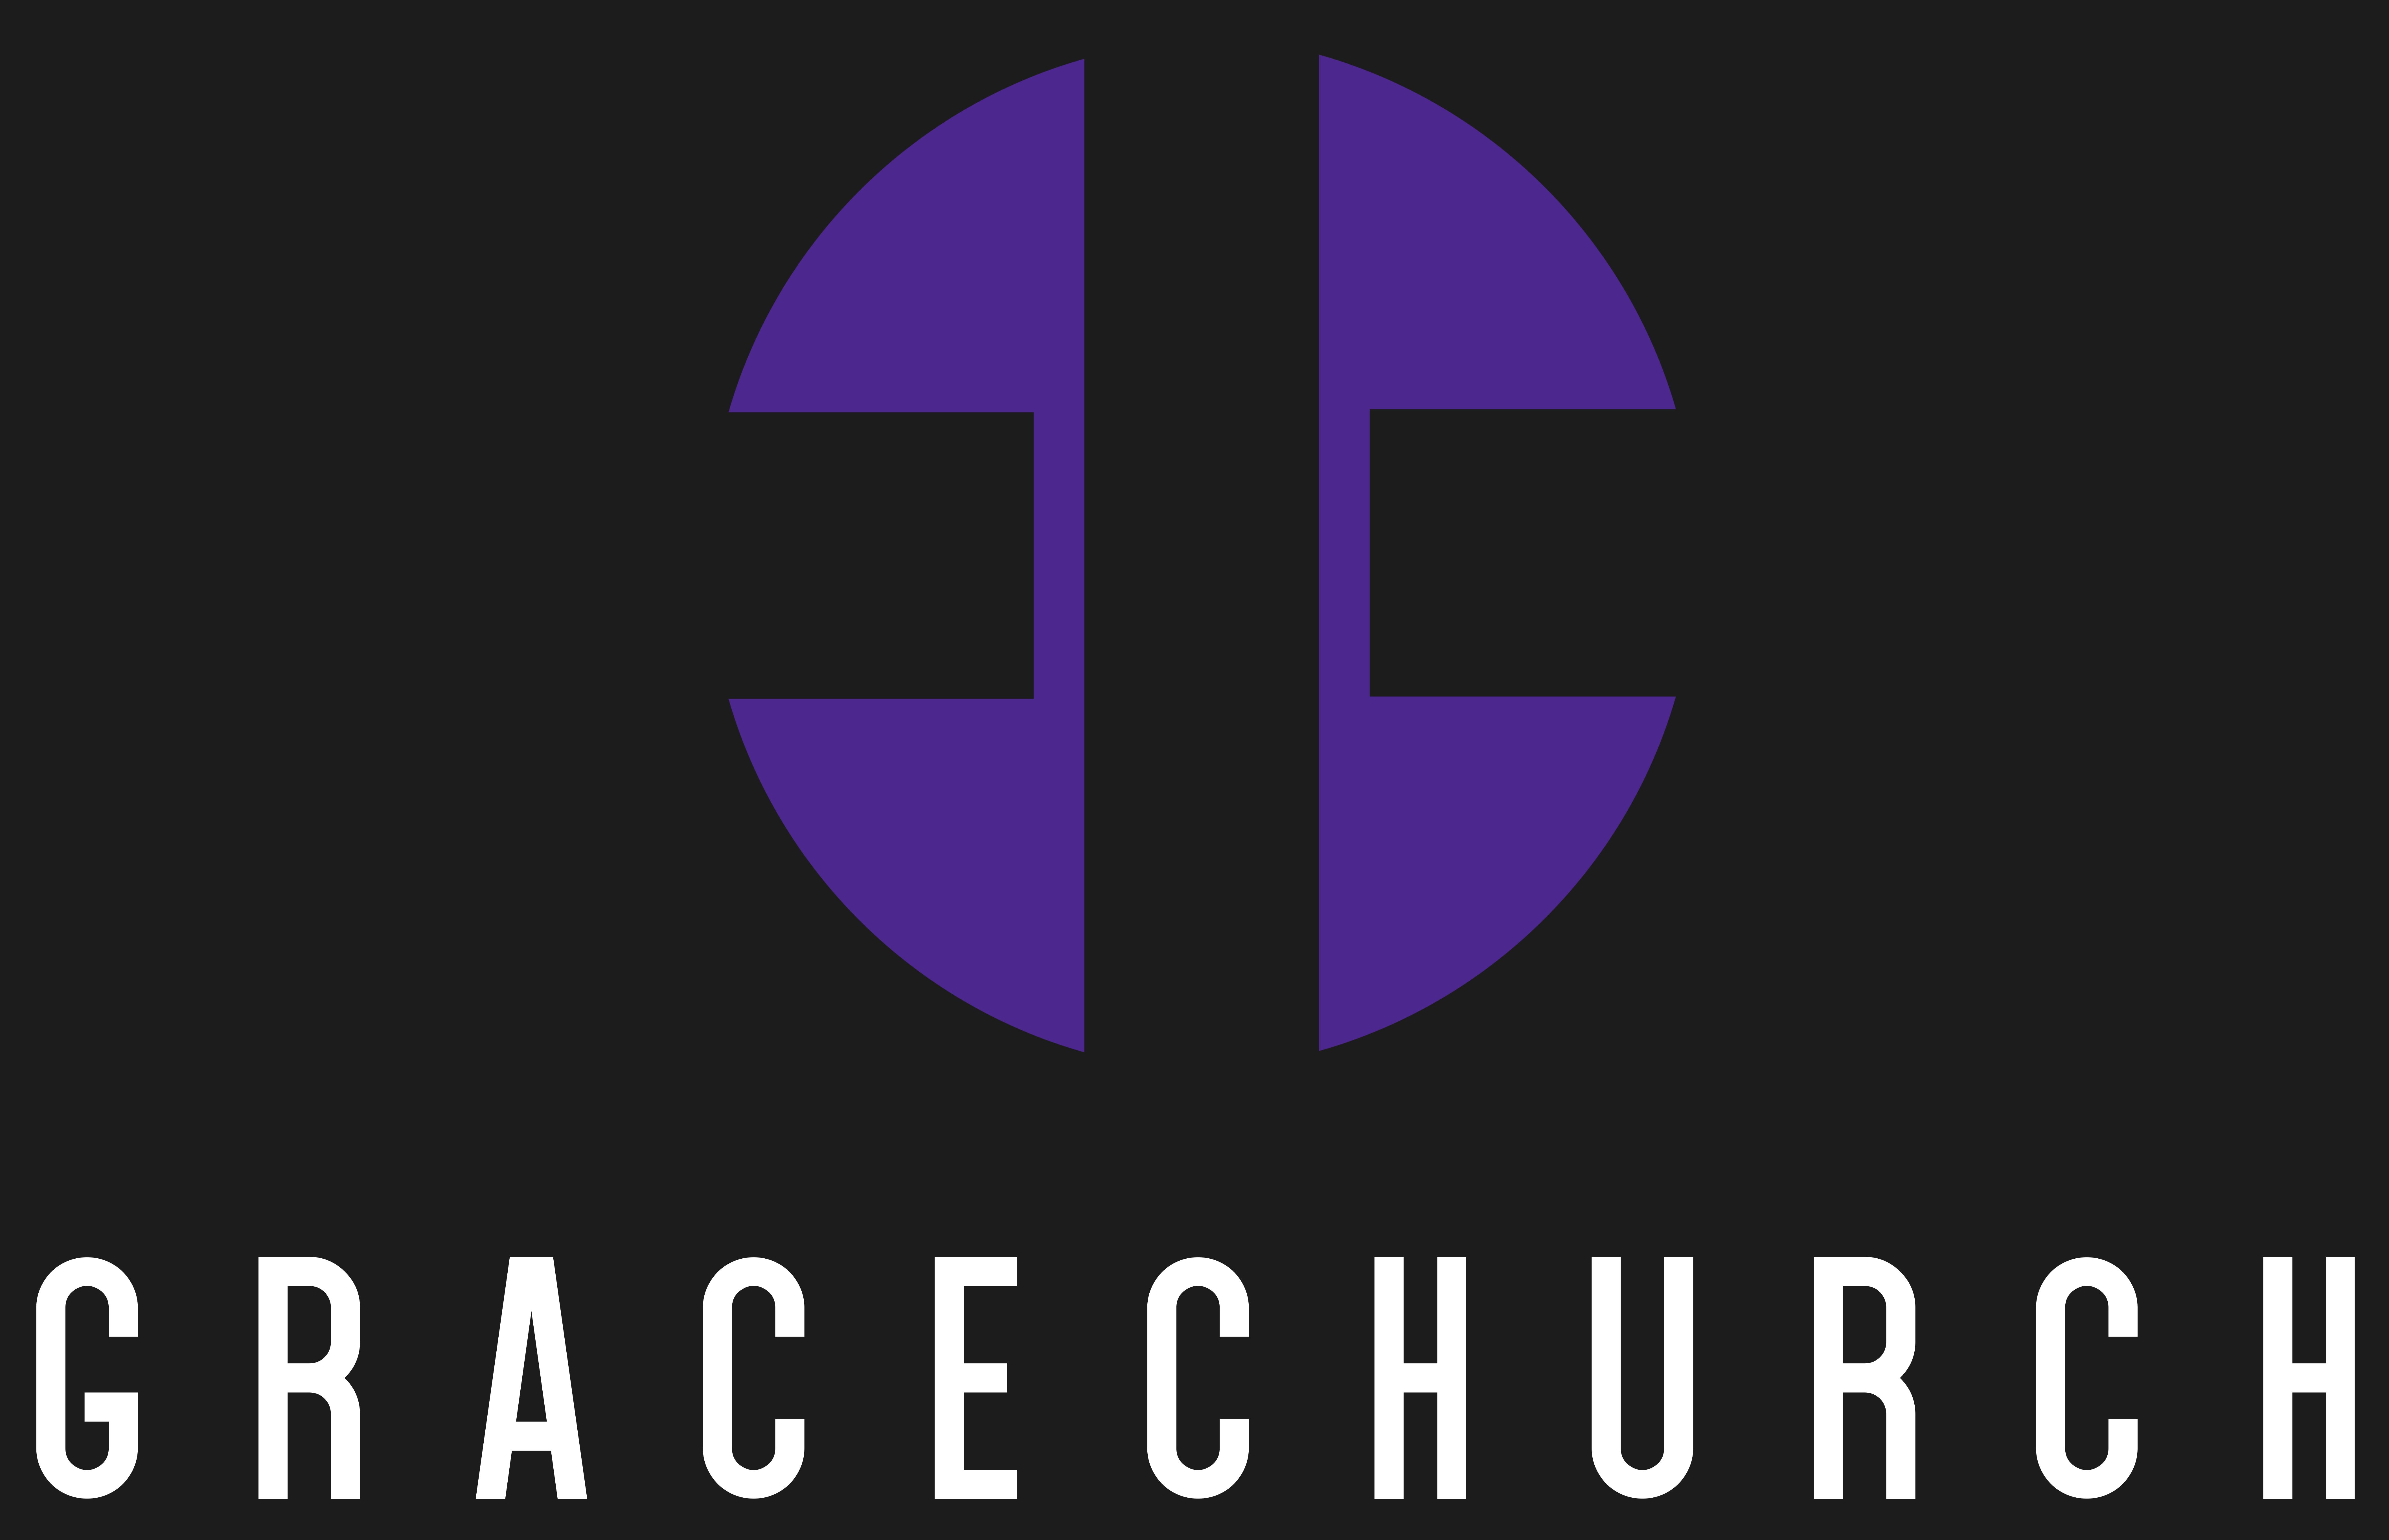 Gracechurch Financial Crime Prevention